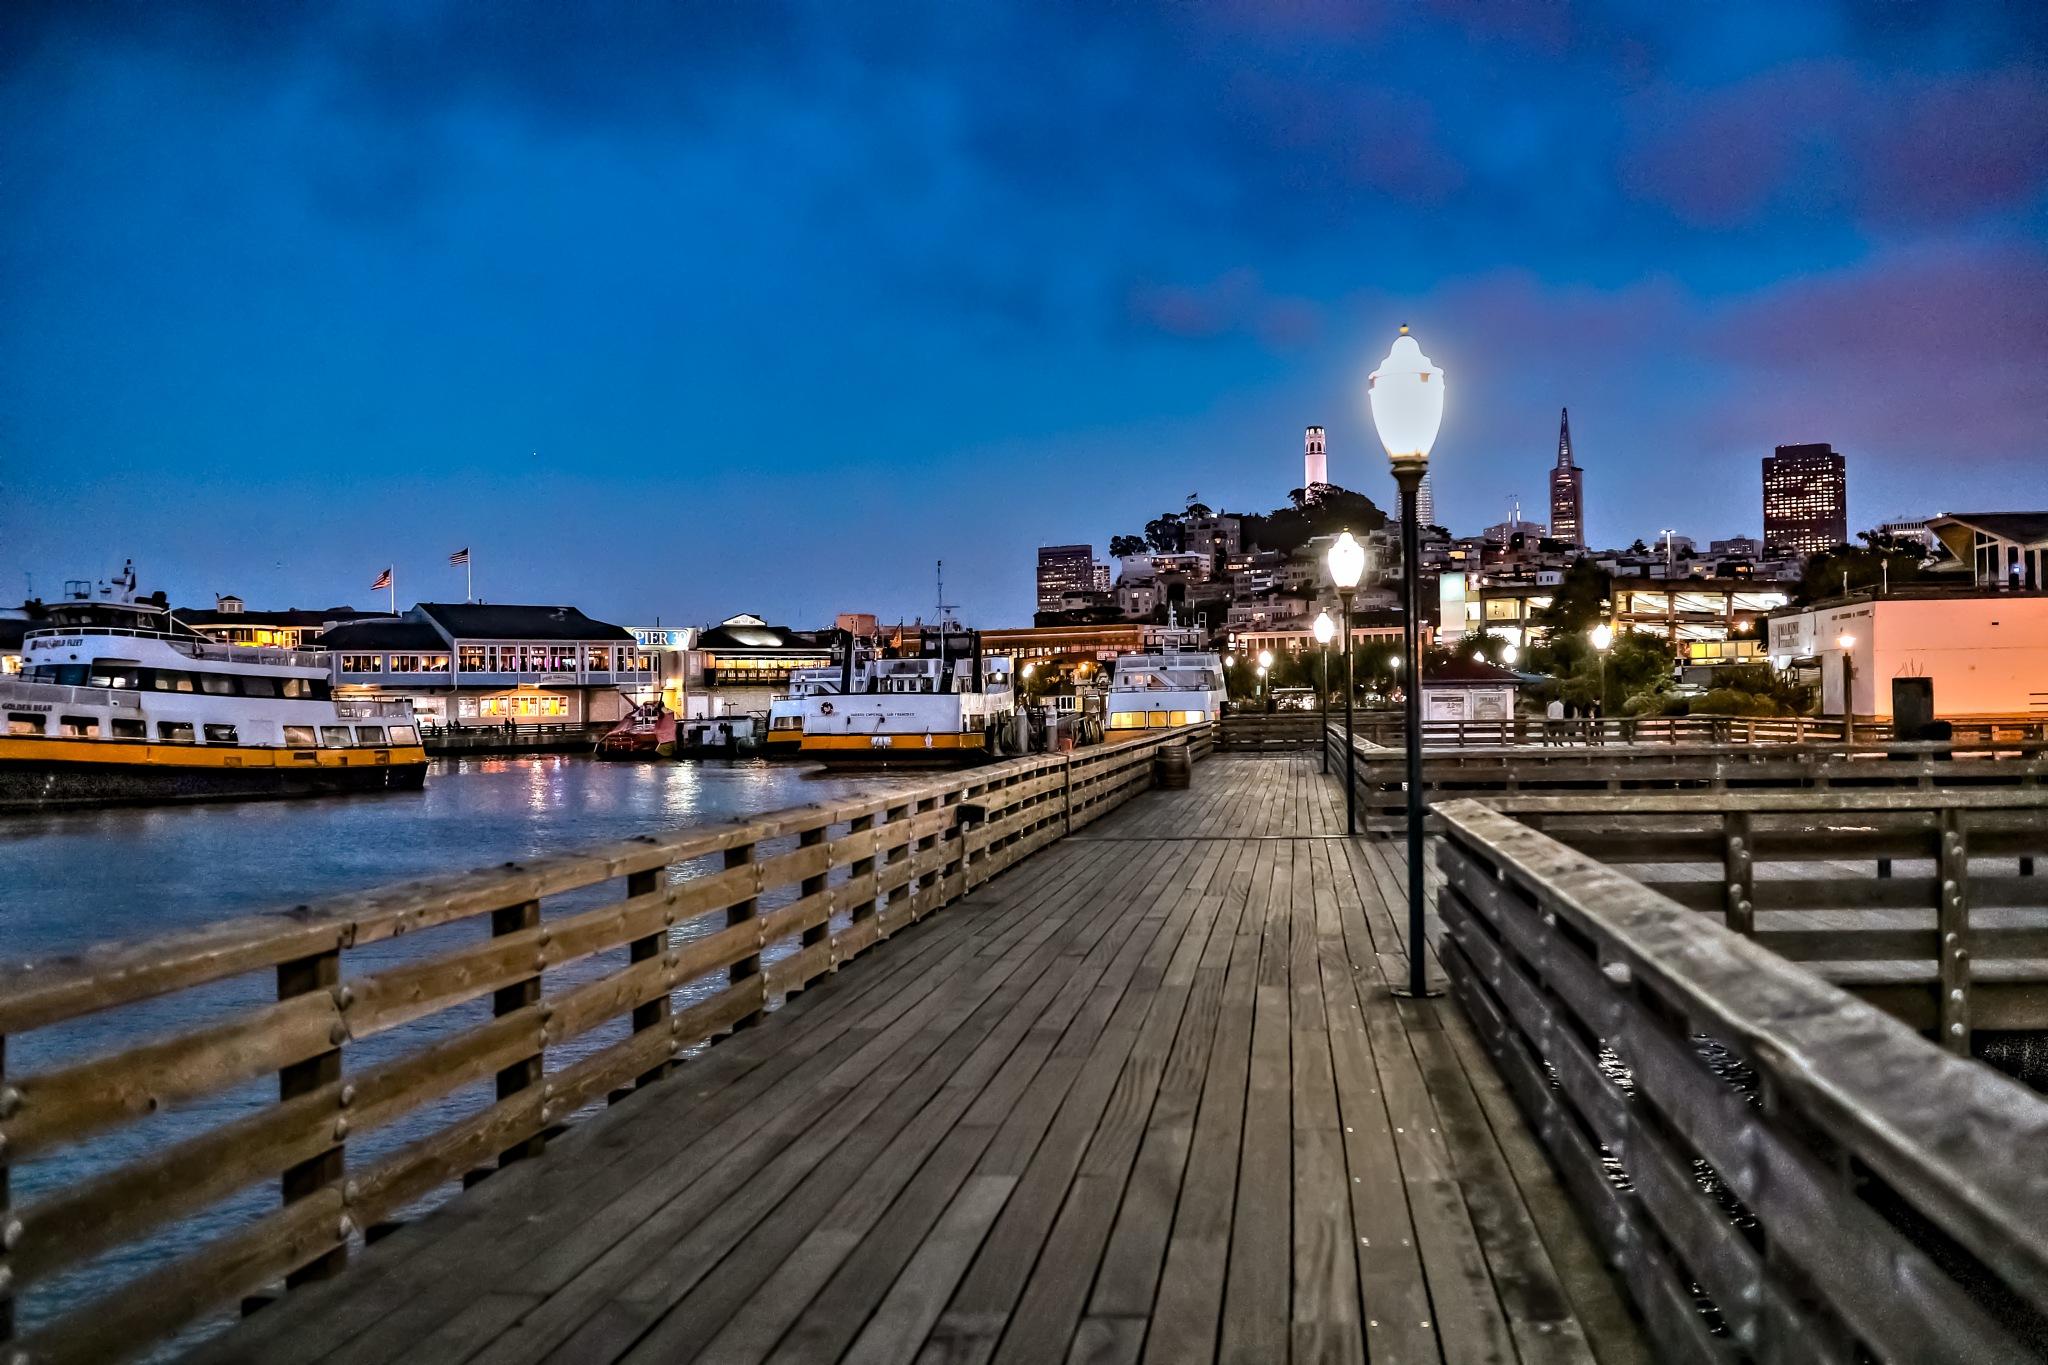 Pier 39 - San Francisco by Mahmoud Shokry